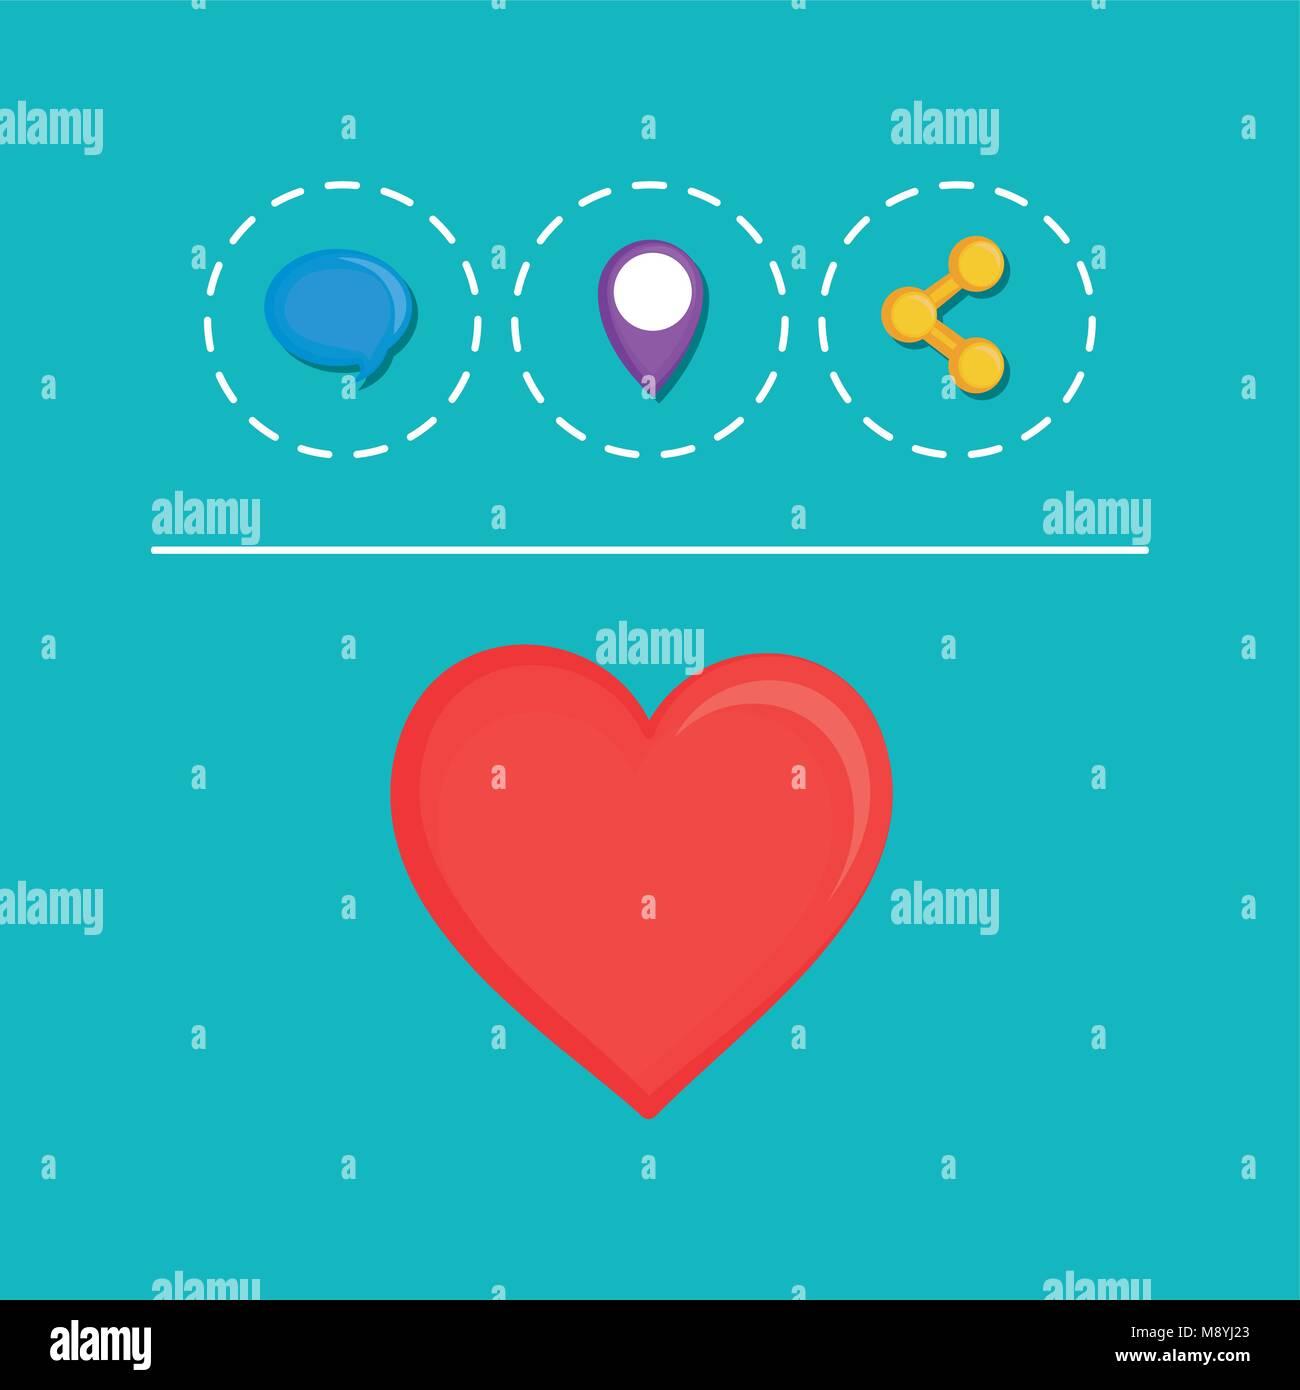 Follow Your Heart Stock Photos & Follow Your Heart Stock Images ...